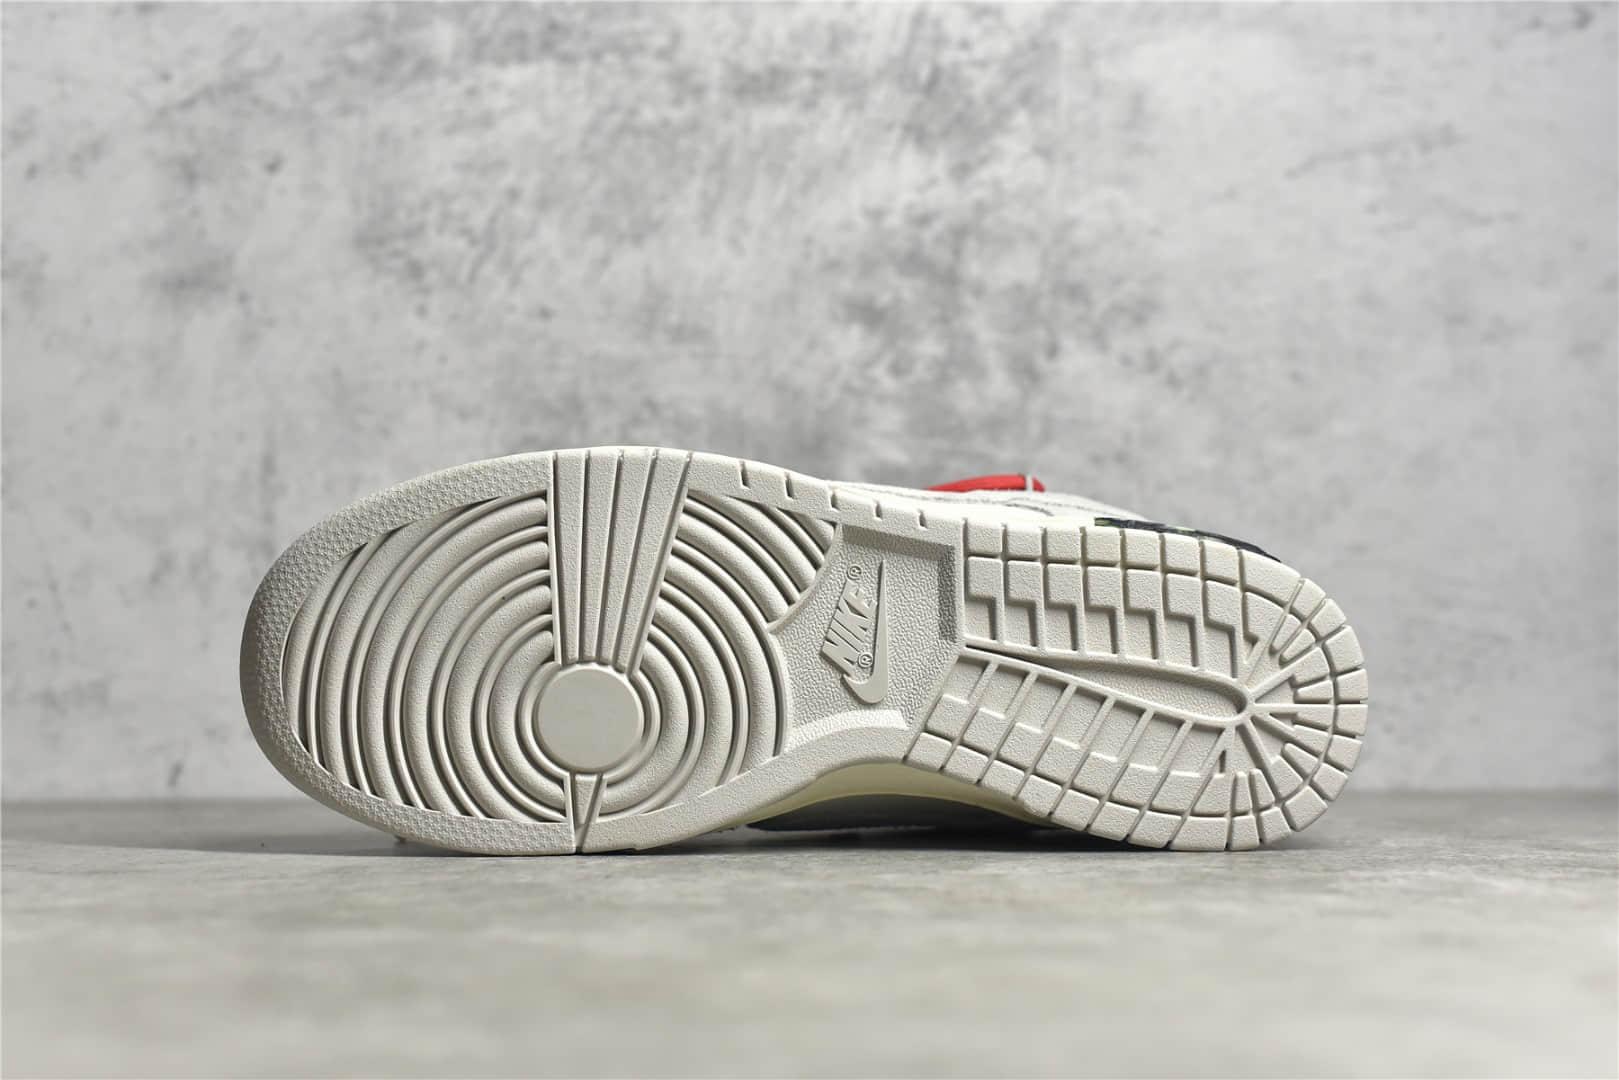 耐克SB Dunk OW联名红鞋带 Off-White™ x Nike SB Dunk Low